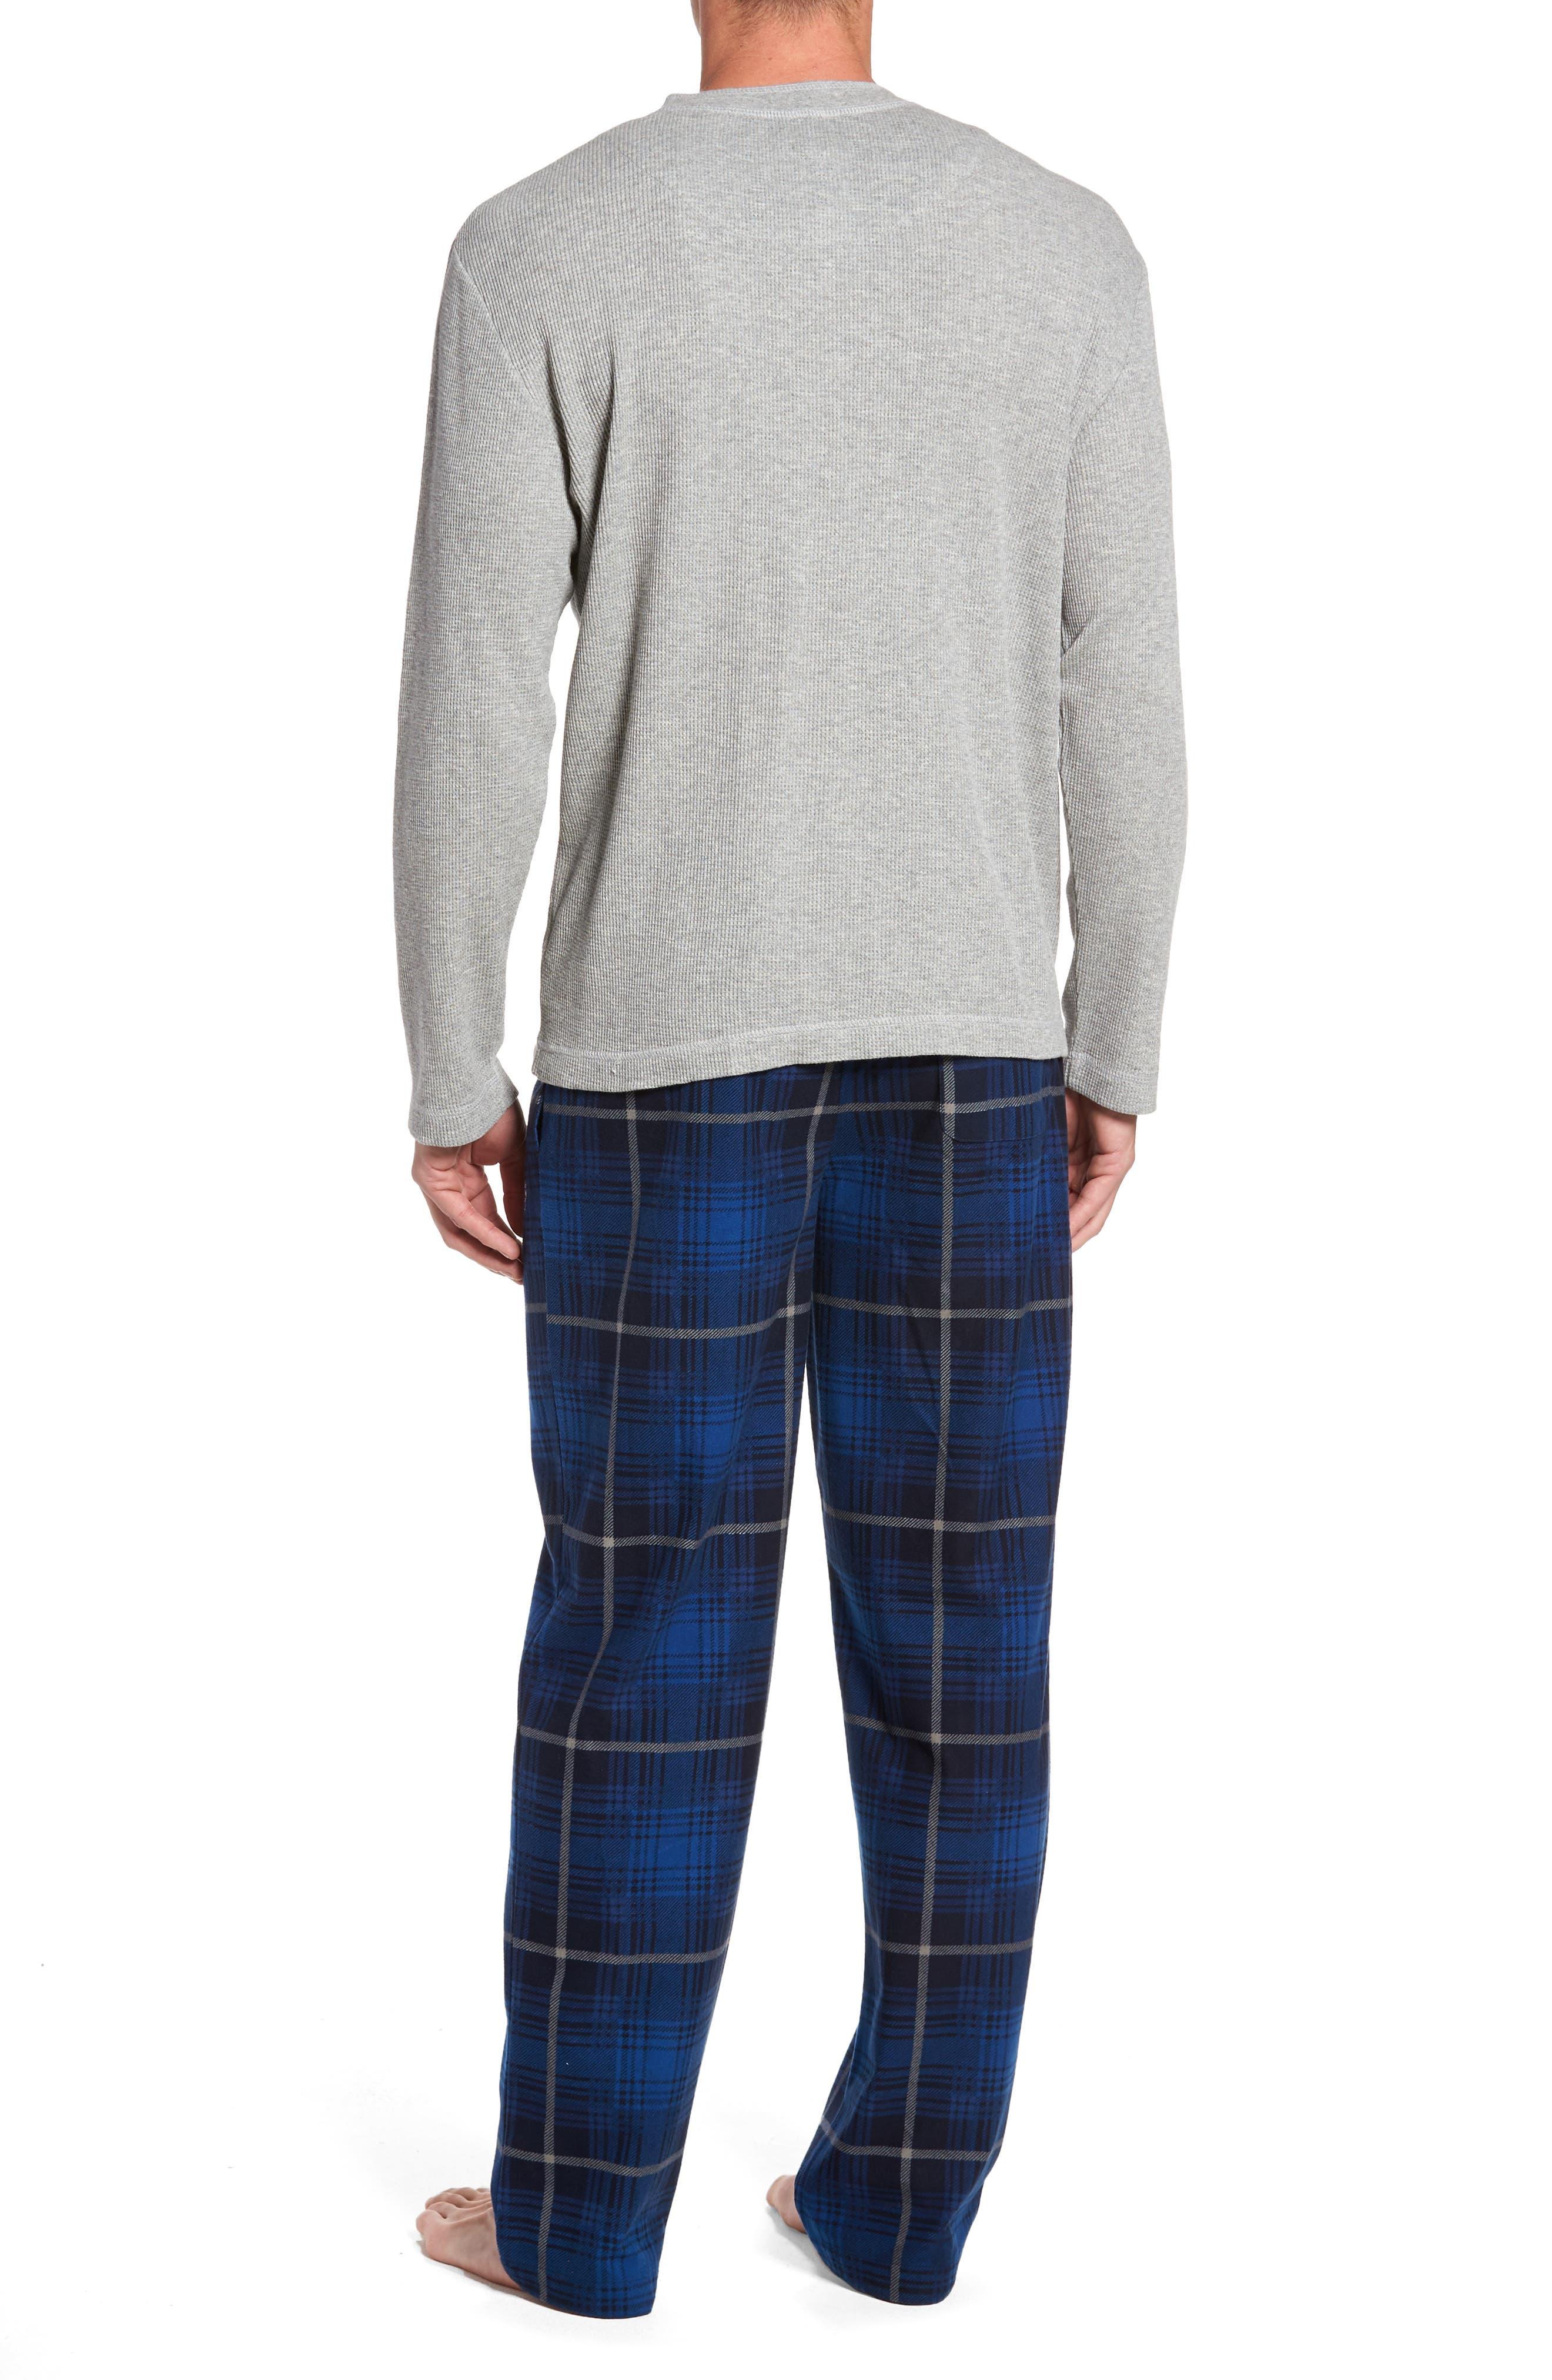 Nifty Gift Henley Shirt & Lounge Pants,                             Alternate thumbnail 2, color,                             025